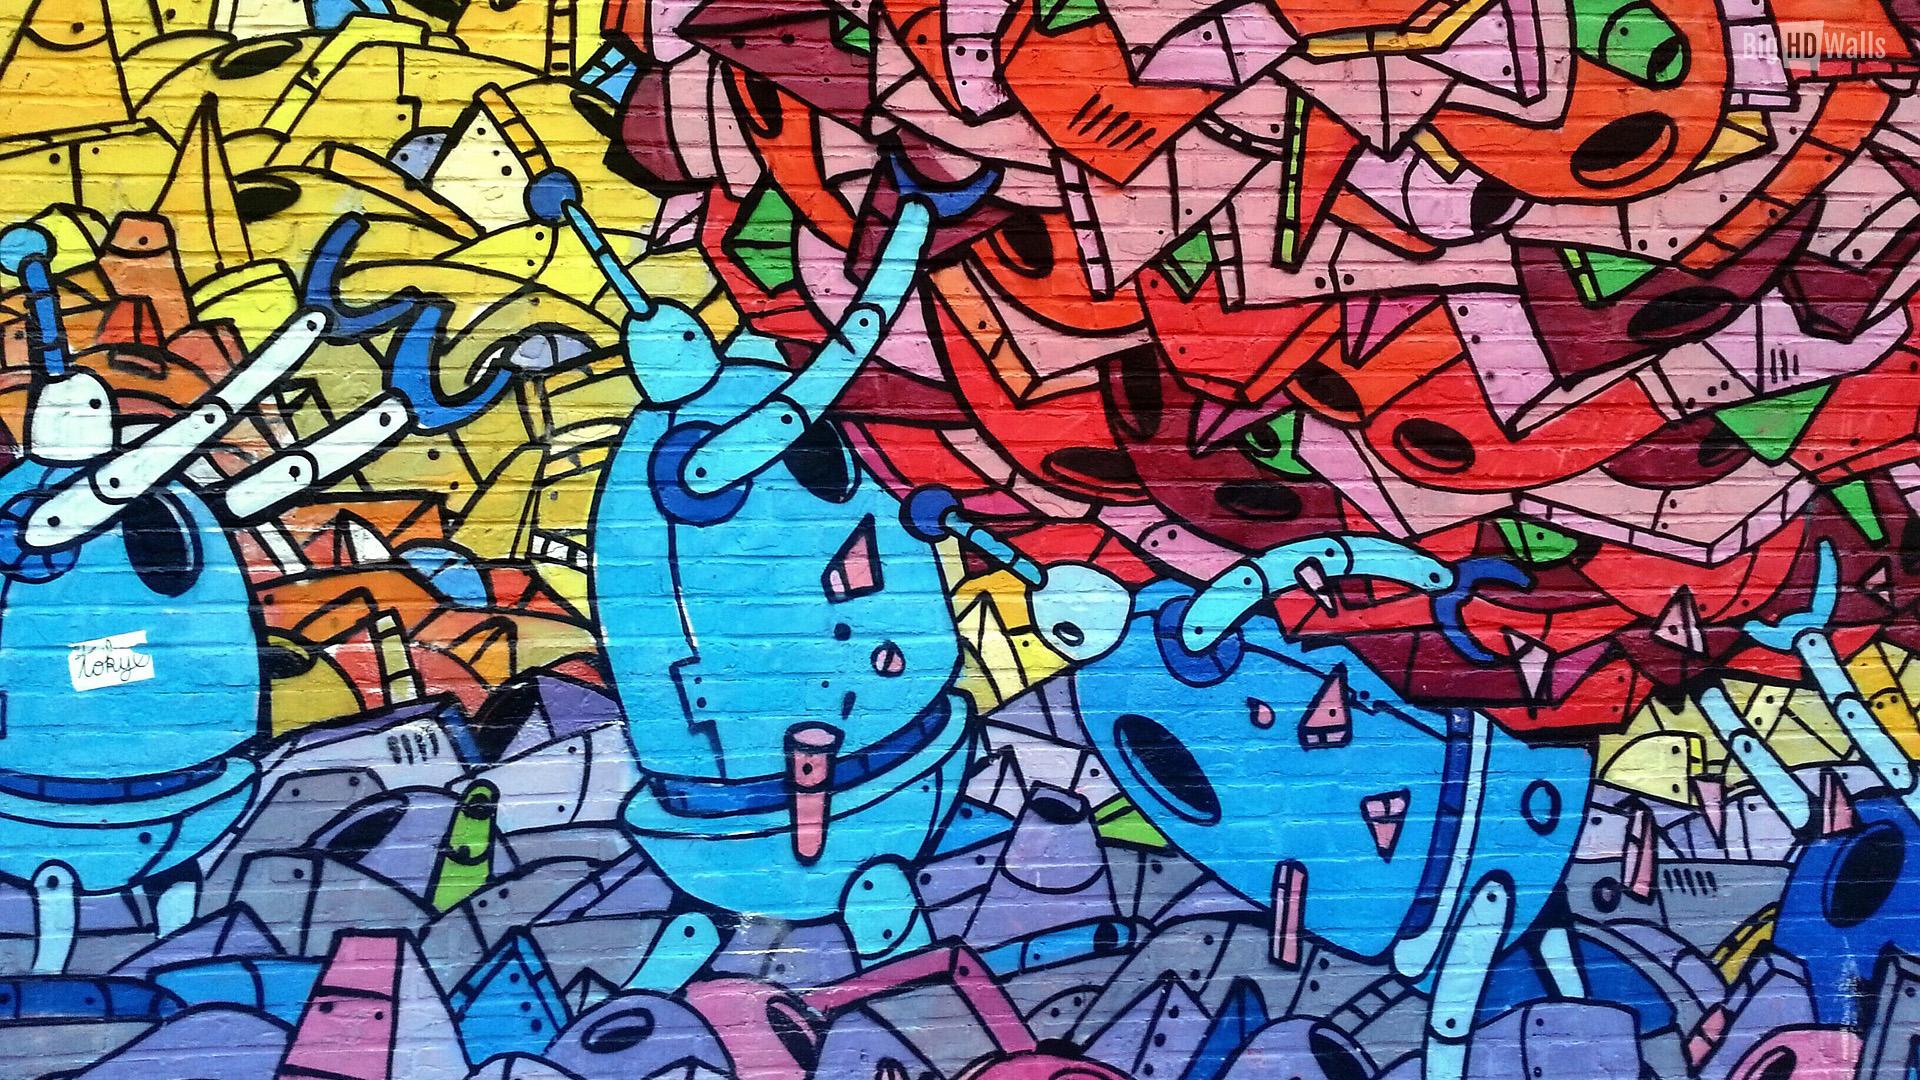 Graffiti art wallpaper - 10 Street Art Graffiti Wallpapers Bighdwalls